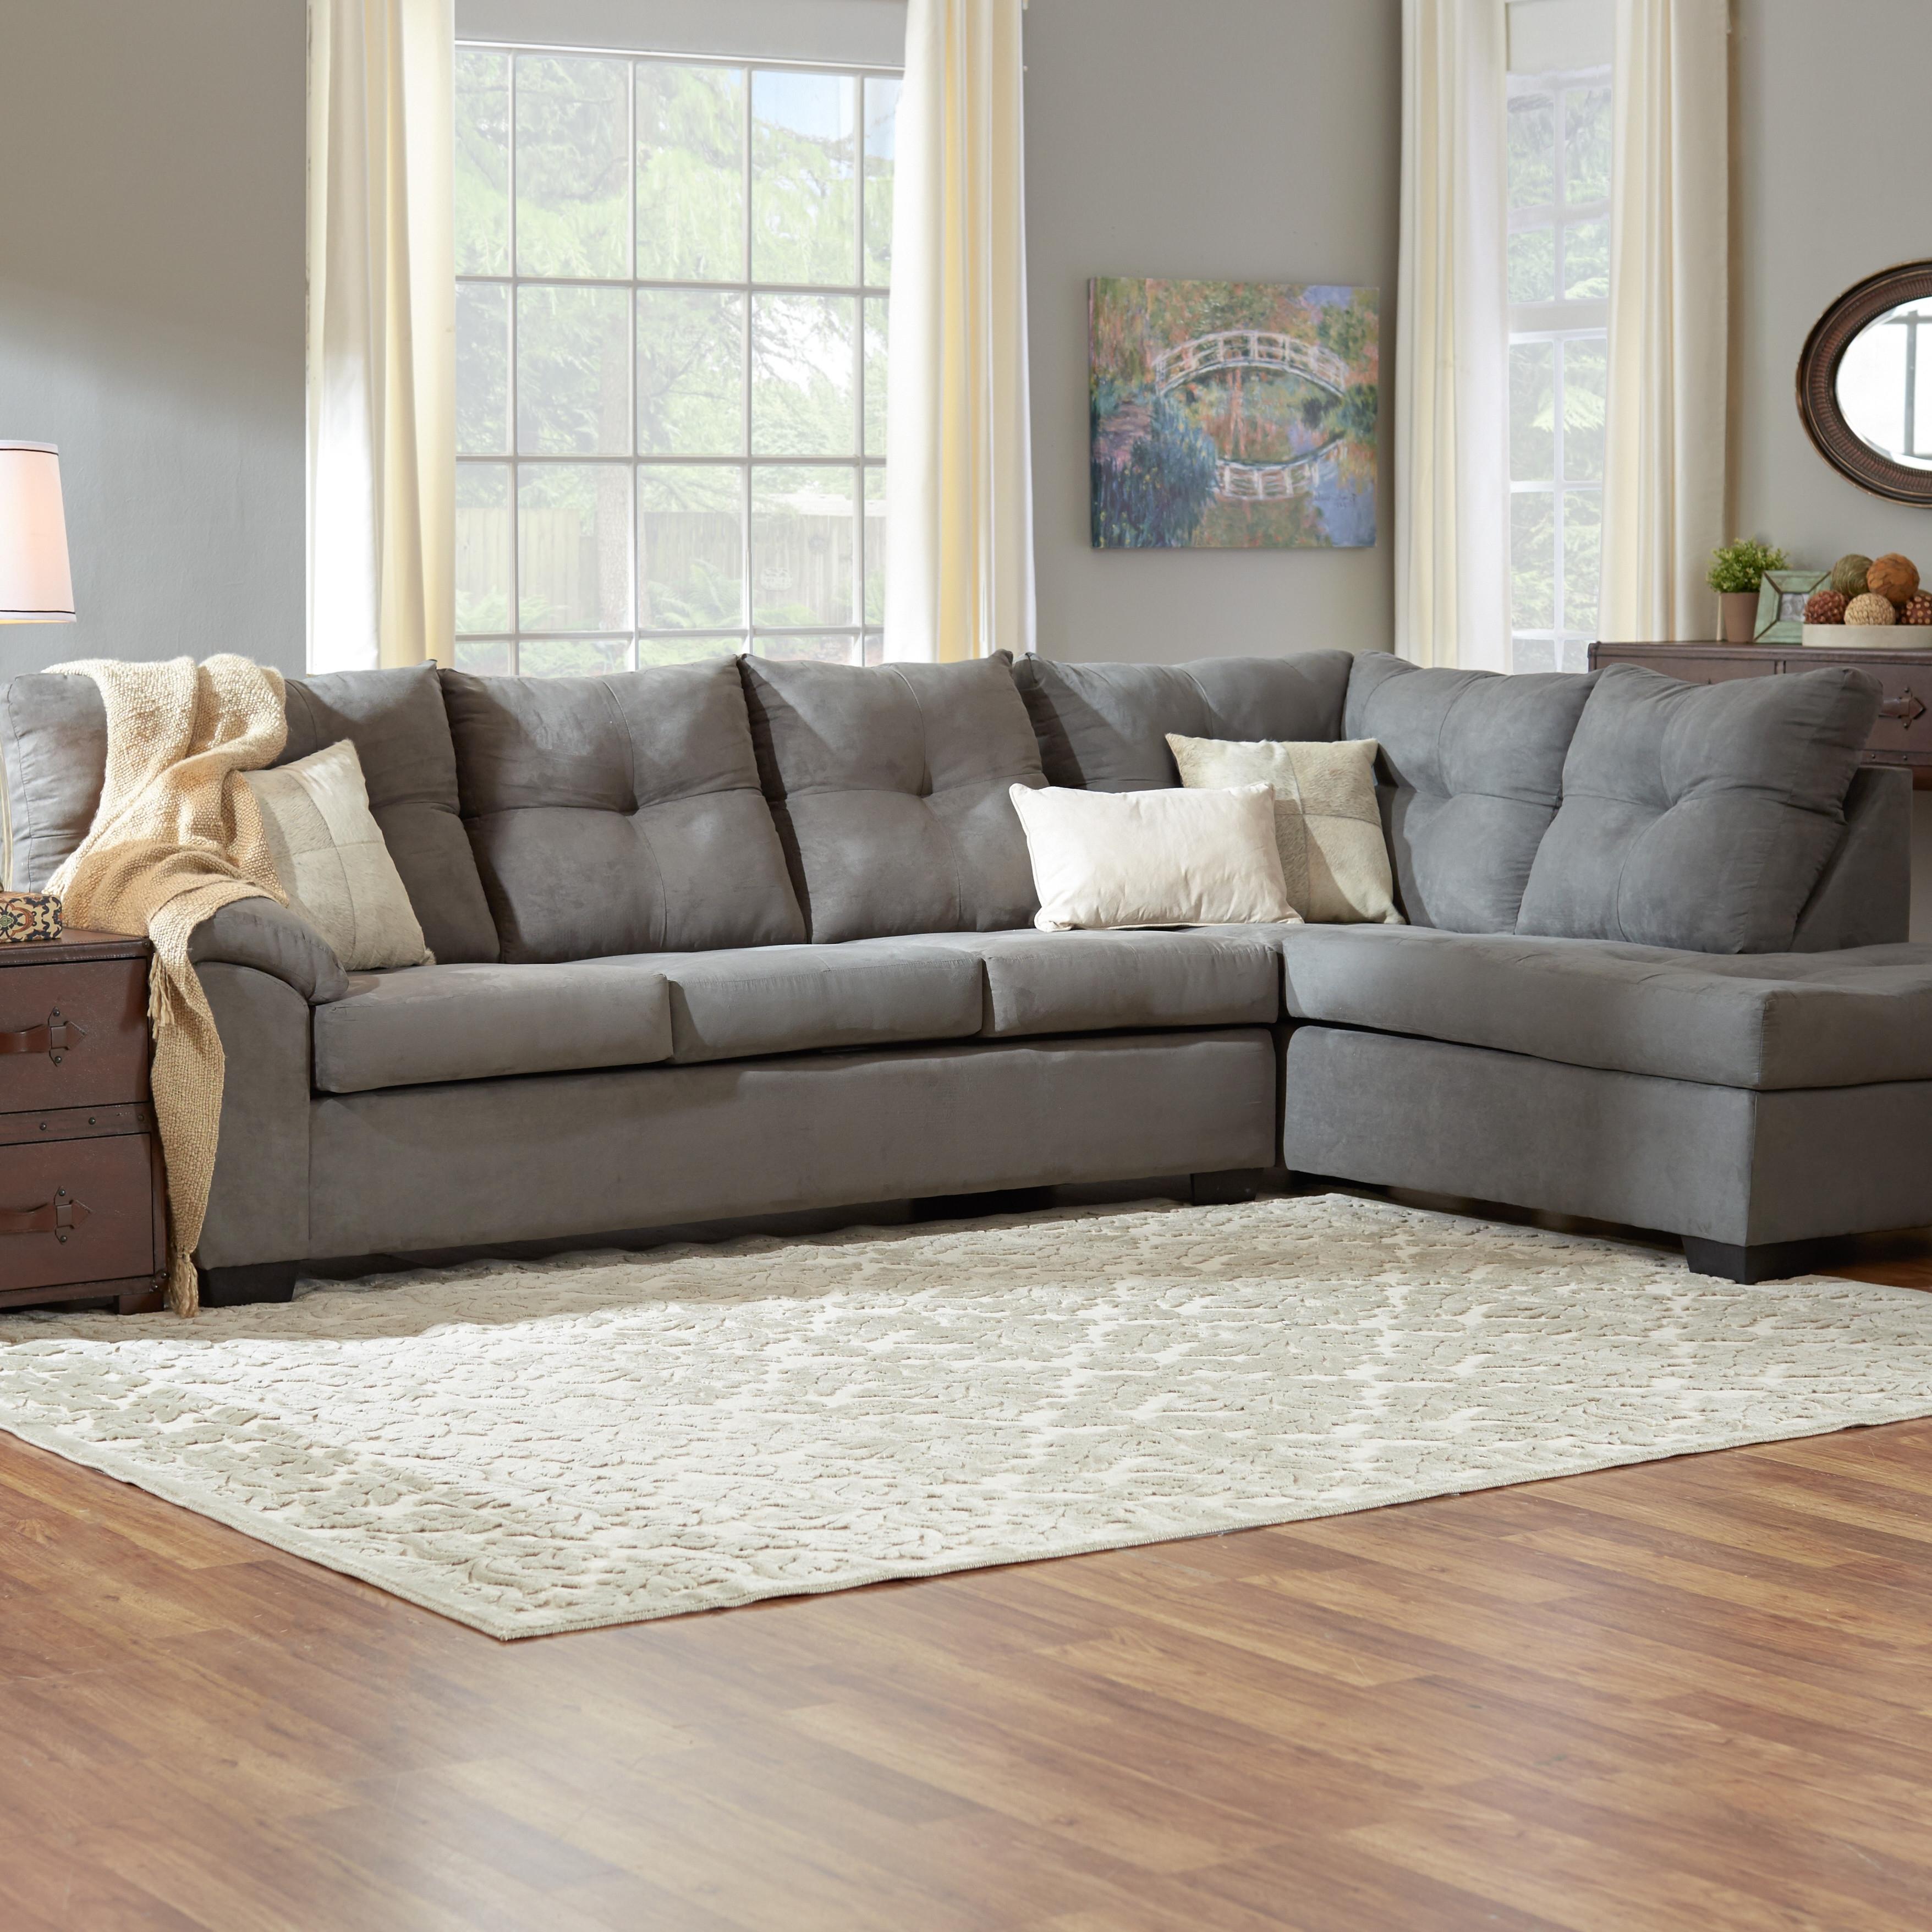 Cool Wayfair Sofa With Furniture Camden Sofa Sectional Couch For Within Wayfair Sectional Sofas (View 3 of 10)